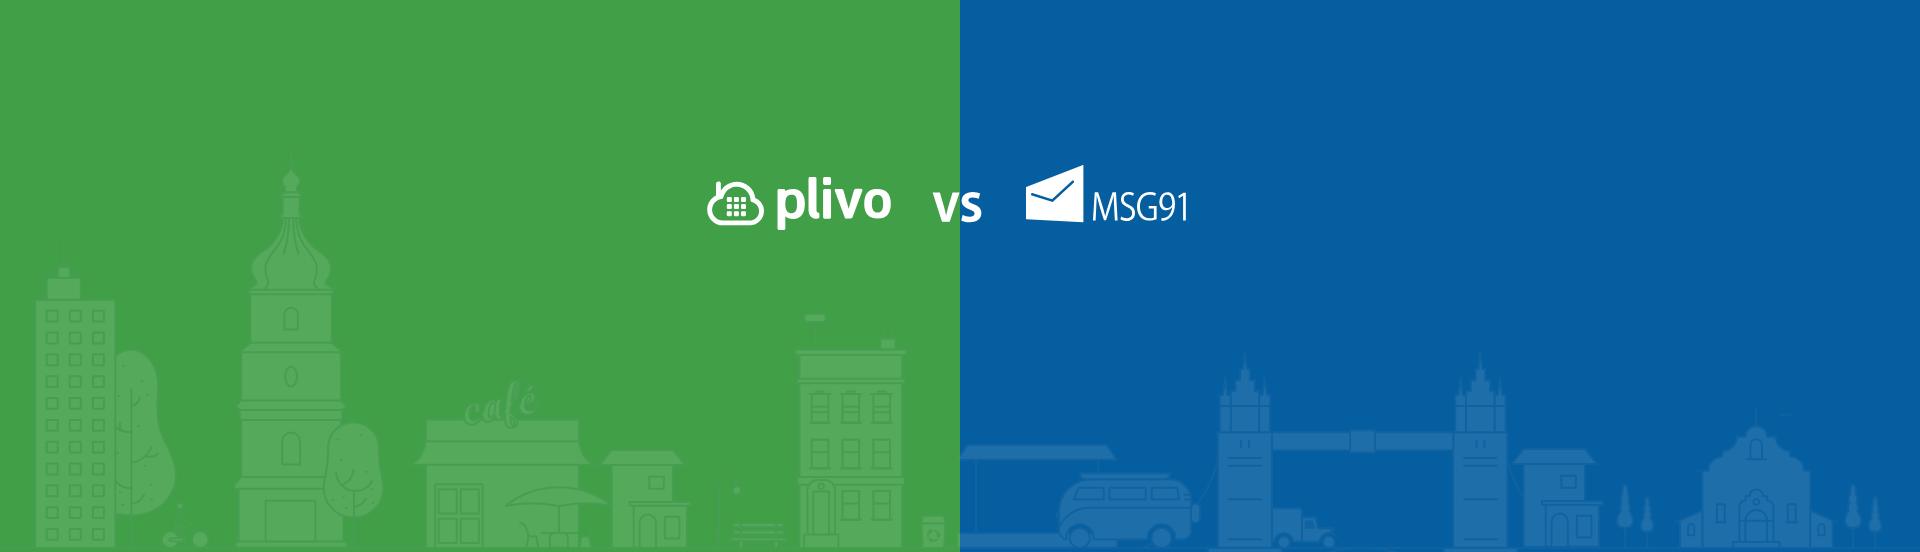 Plivo vs MSG91: Choose the right Bulk SMS service